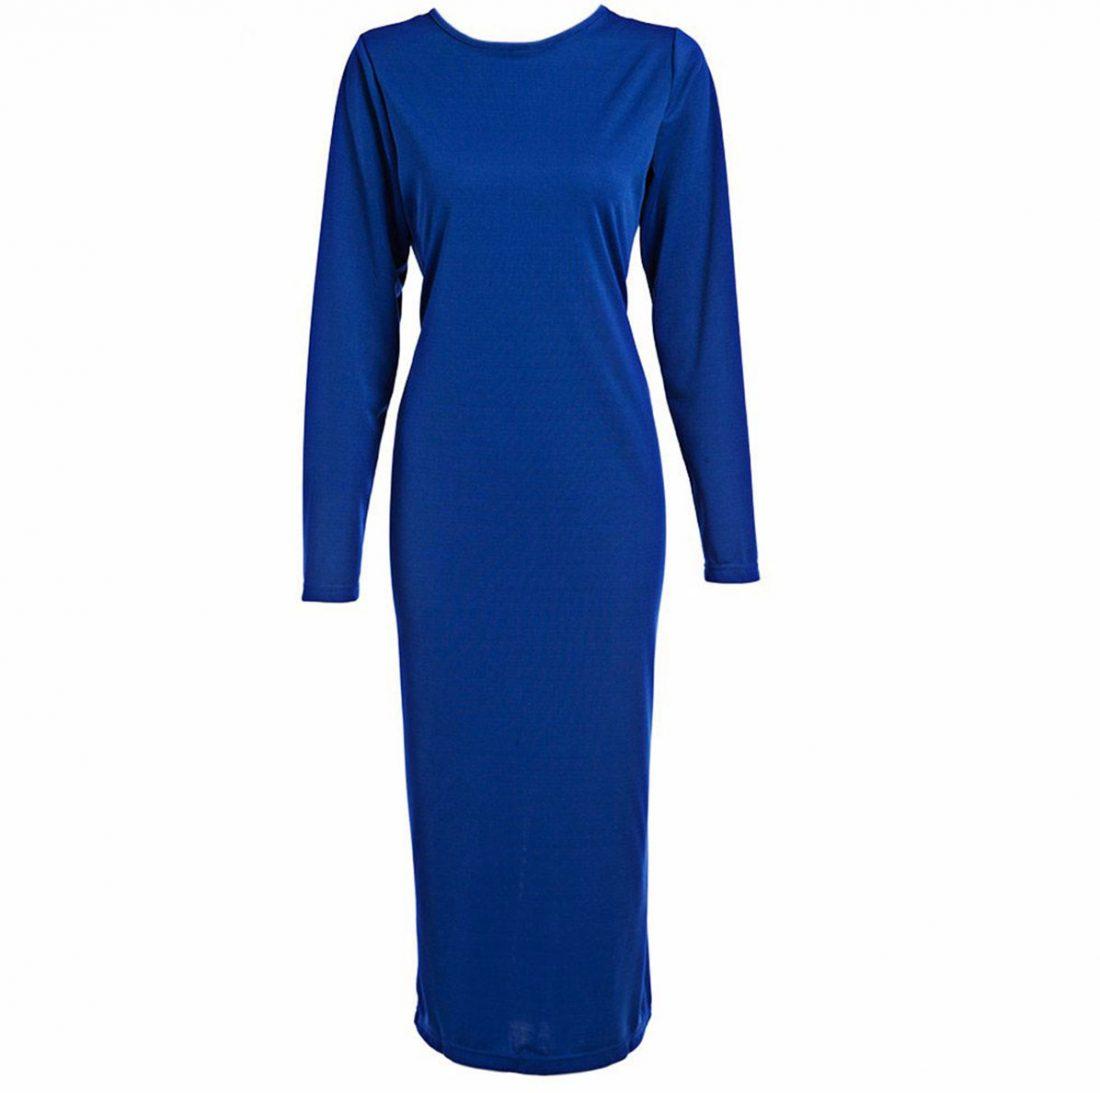 M0185 blue7 Office Evening Dresses maureens.com boutique